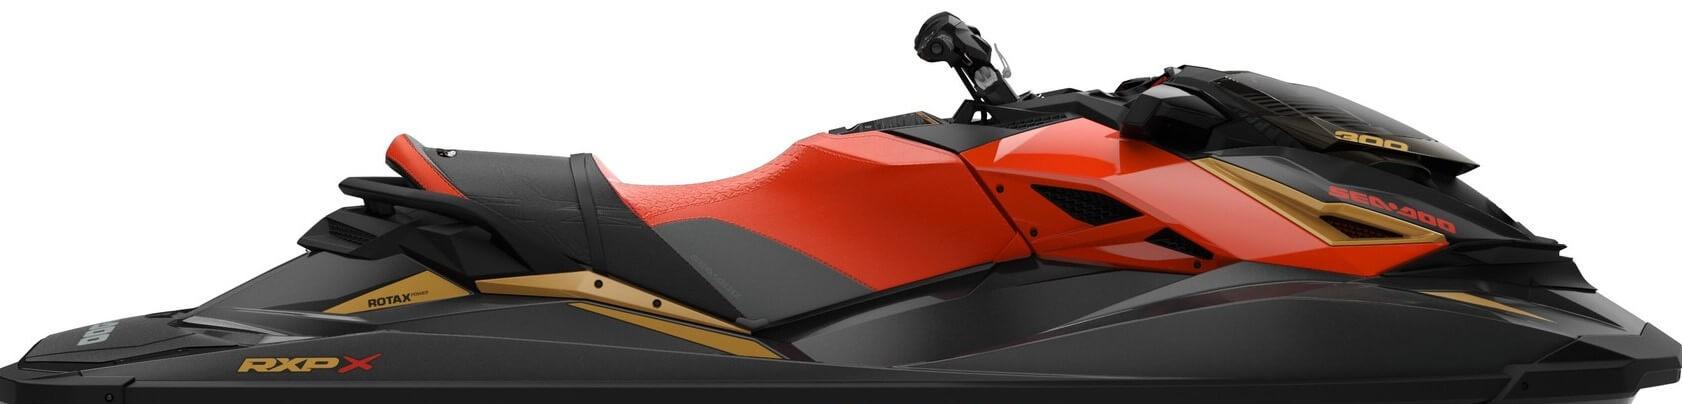 Seadoo RXP Merah 300 HP